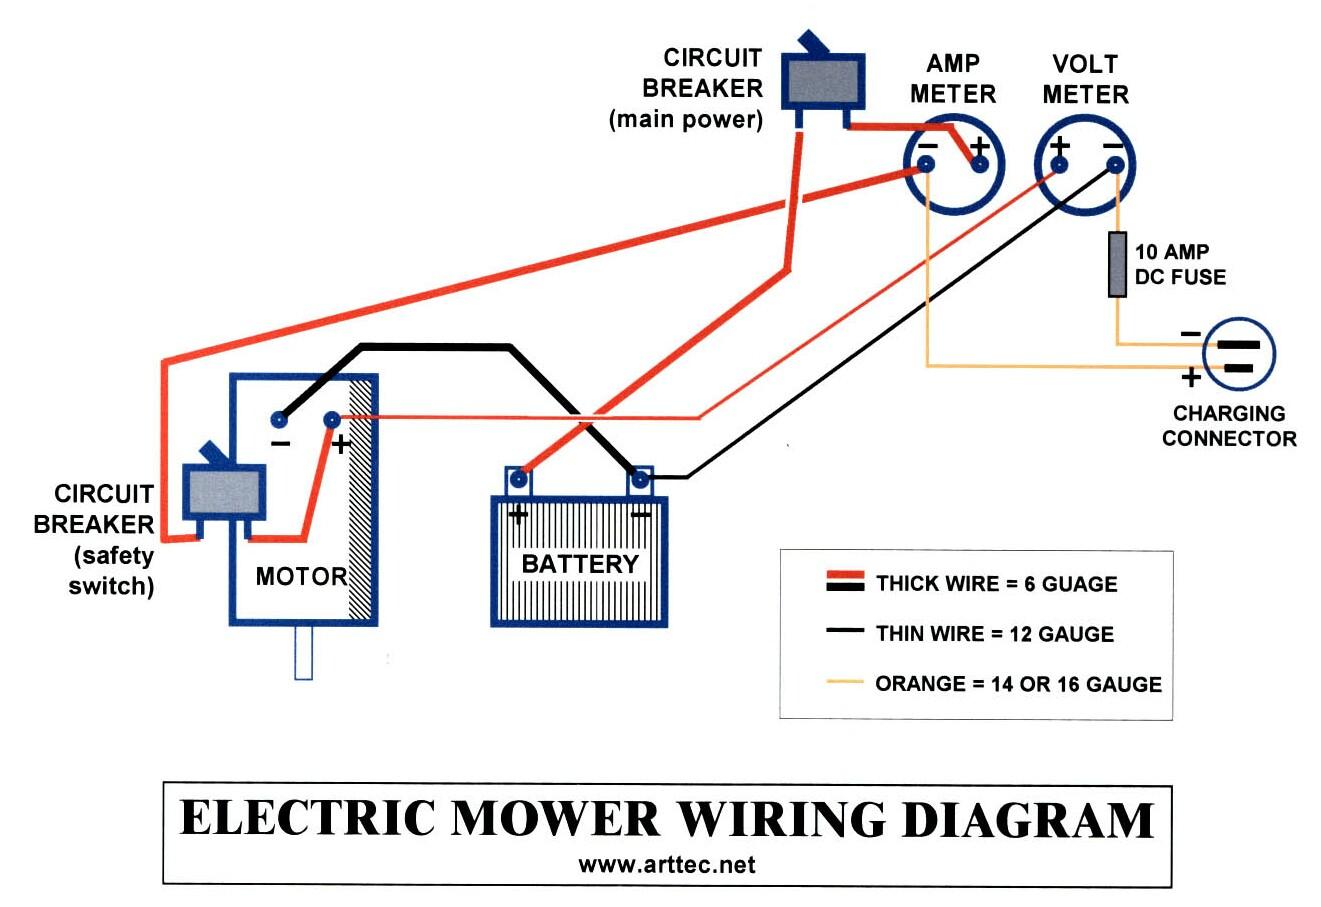 amperage gauge wiring diagram wiring diagrams folder ammeter gauge wiring diagram amp gauge wiring diagram 12v